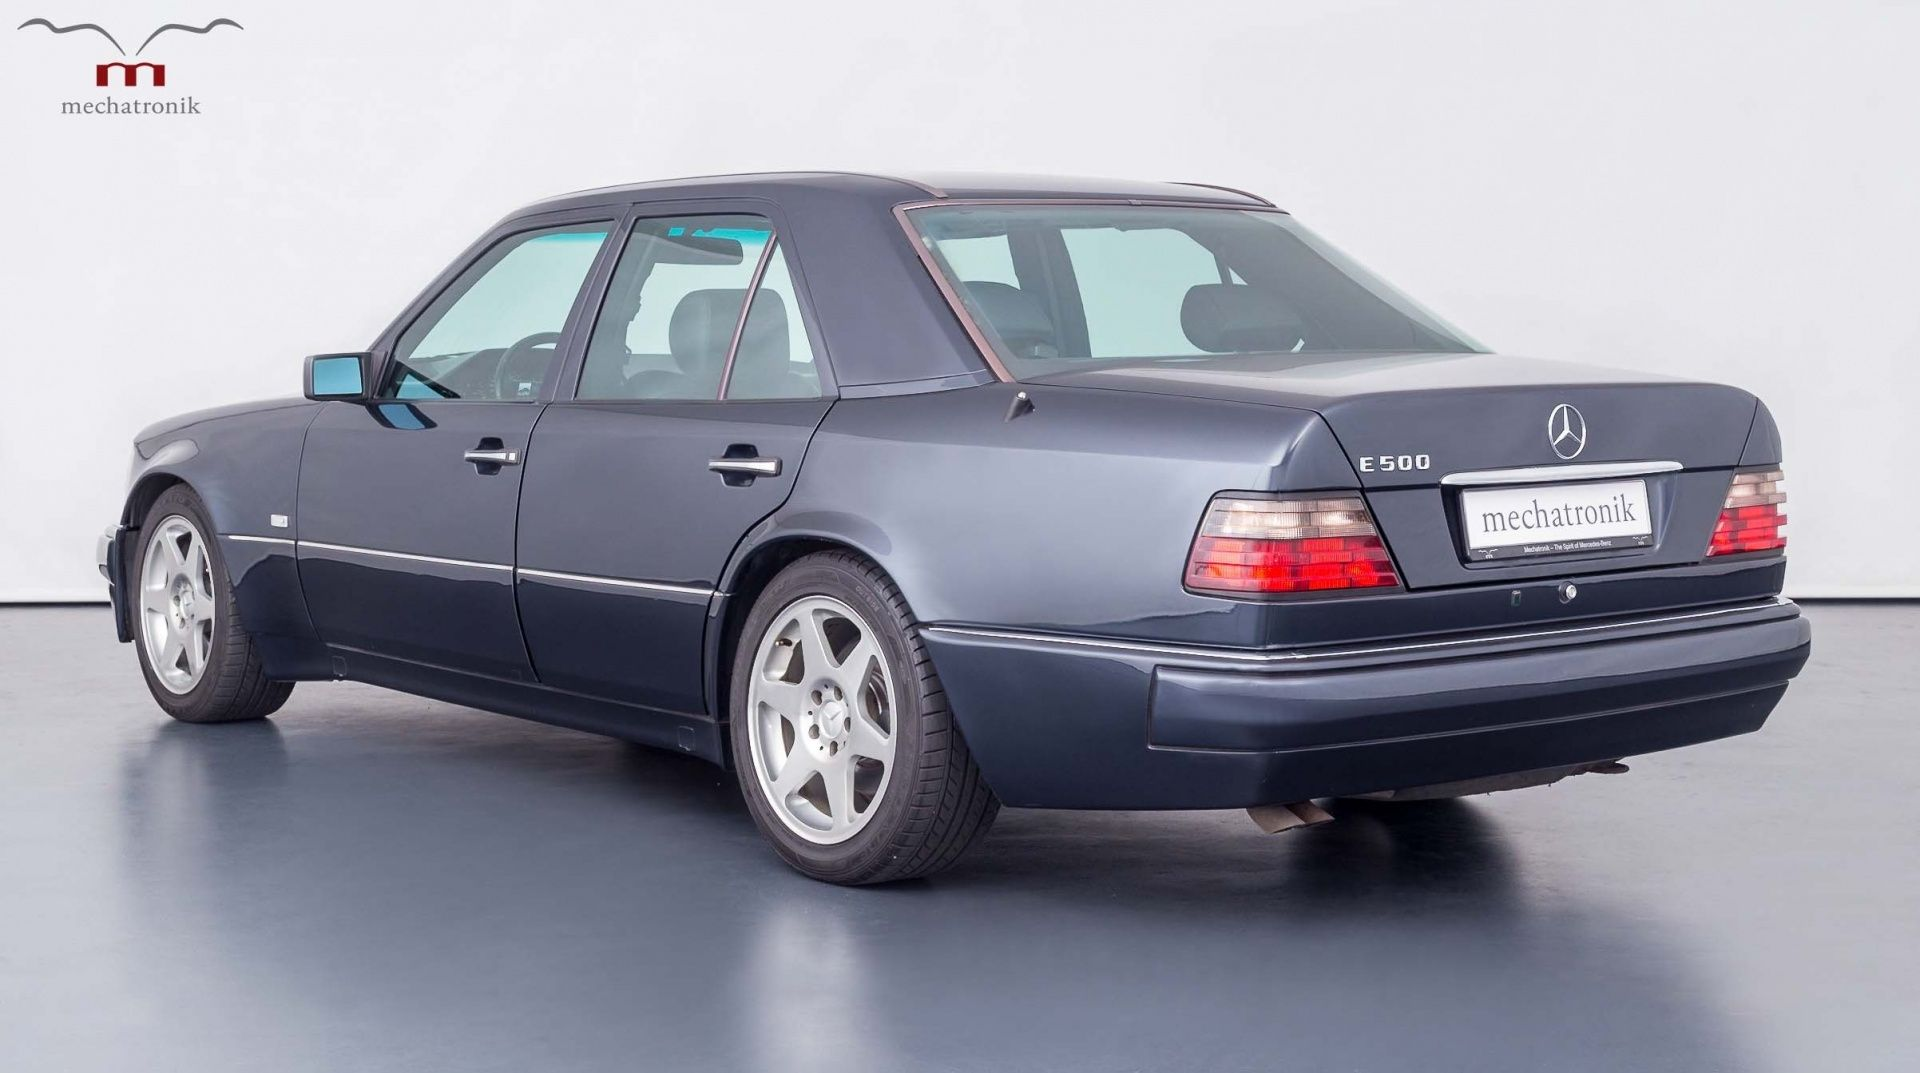 1994 Mercedes-Benz E-Class - E 500 Limited Edition | Classic Driver Market